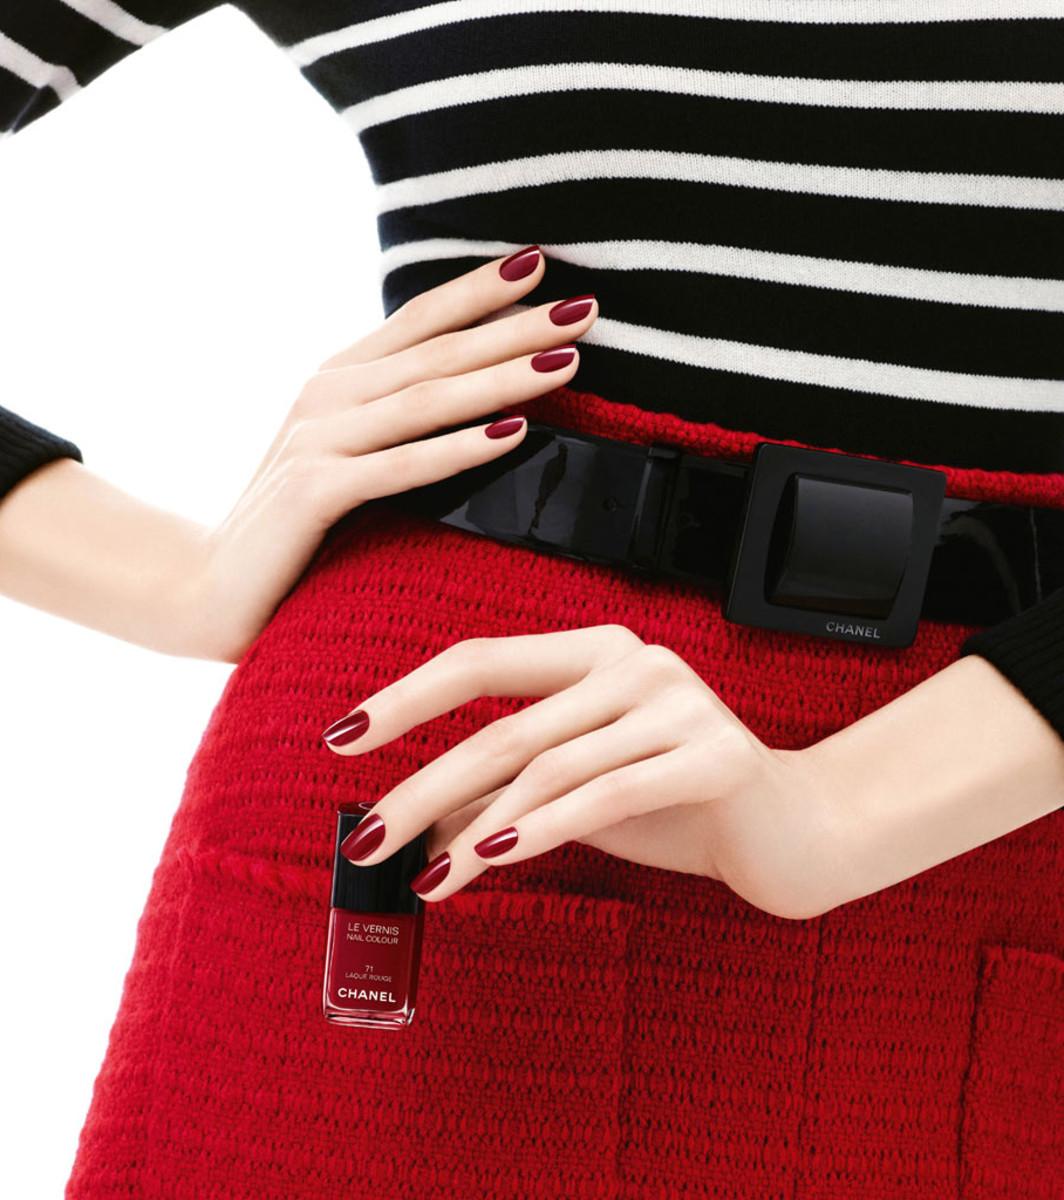 Chanel-Les-Rouges-Culte-Fall-2014_Chanel Le Vernis